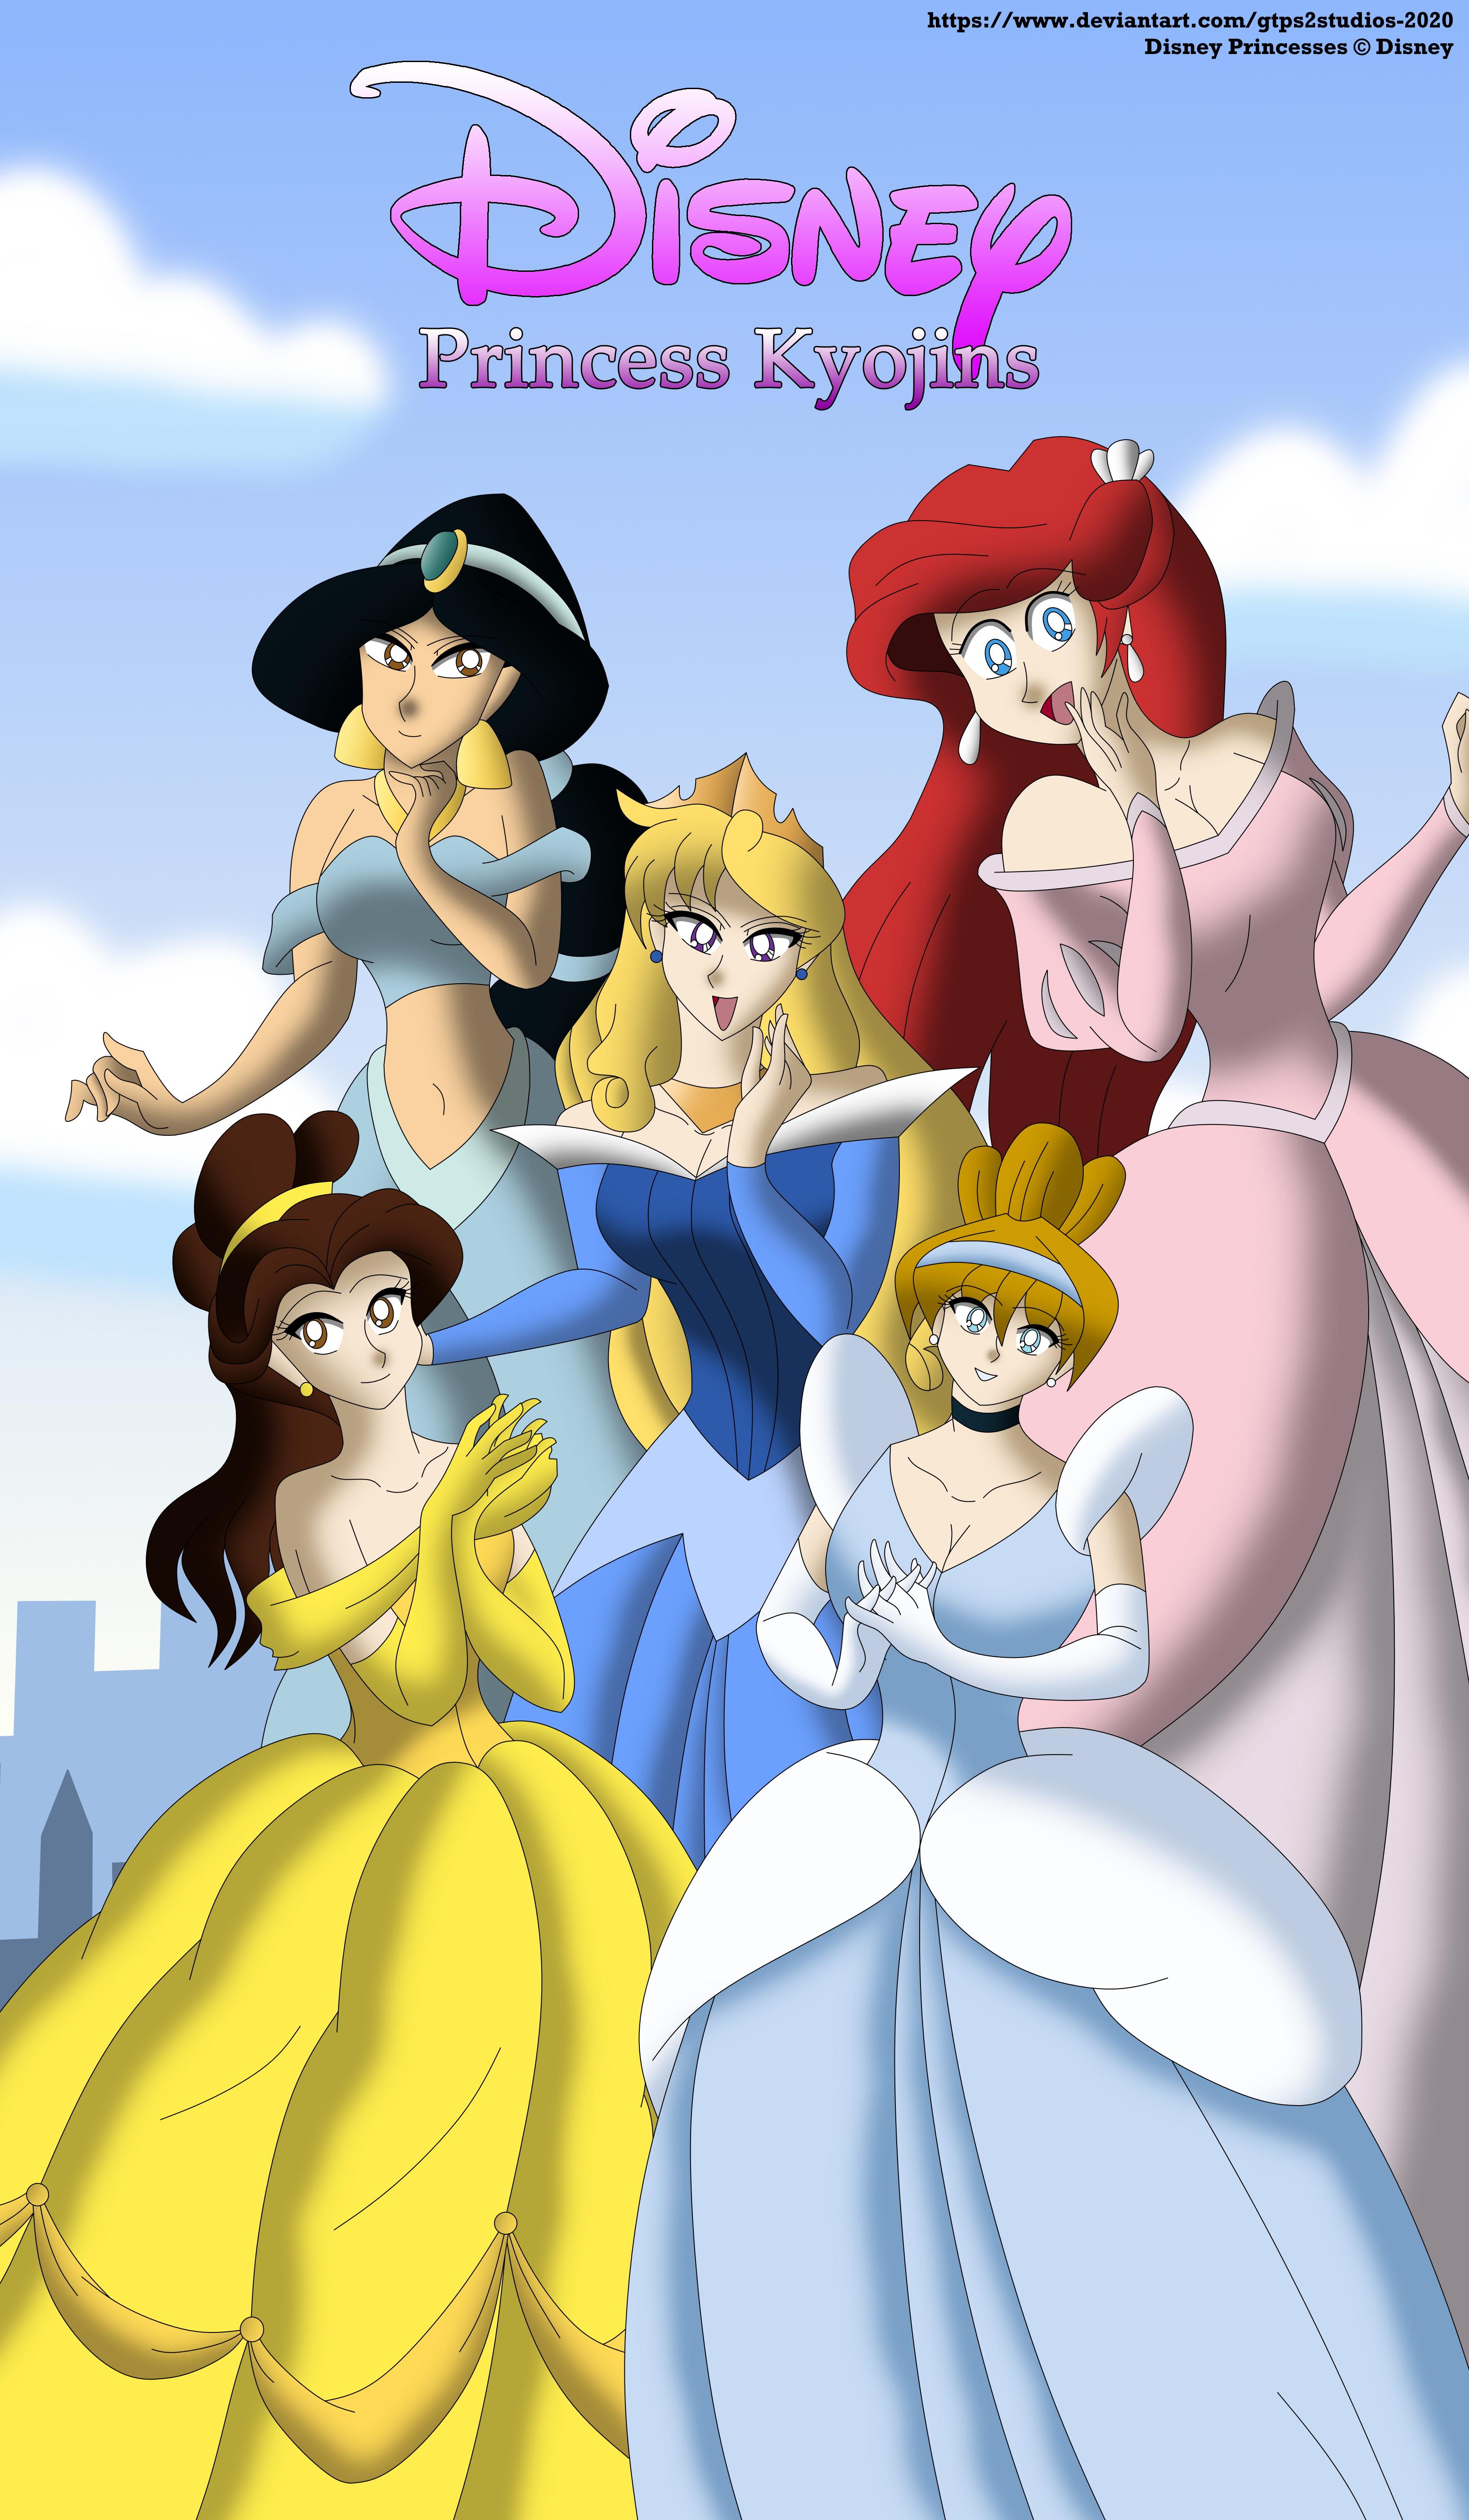 Disney Princess Kyojins Poster By Gtps2studios 2020 On Deviantart